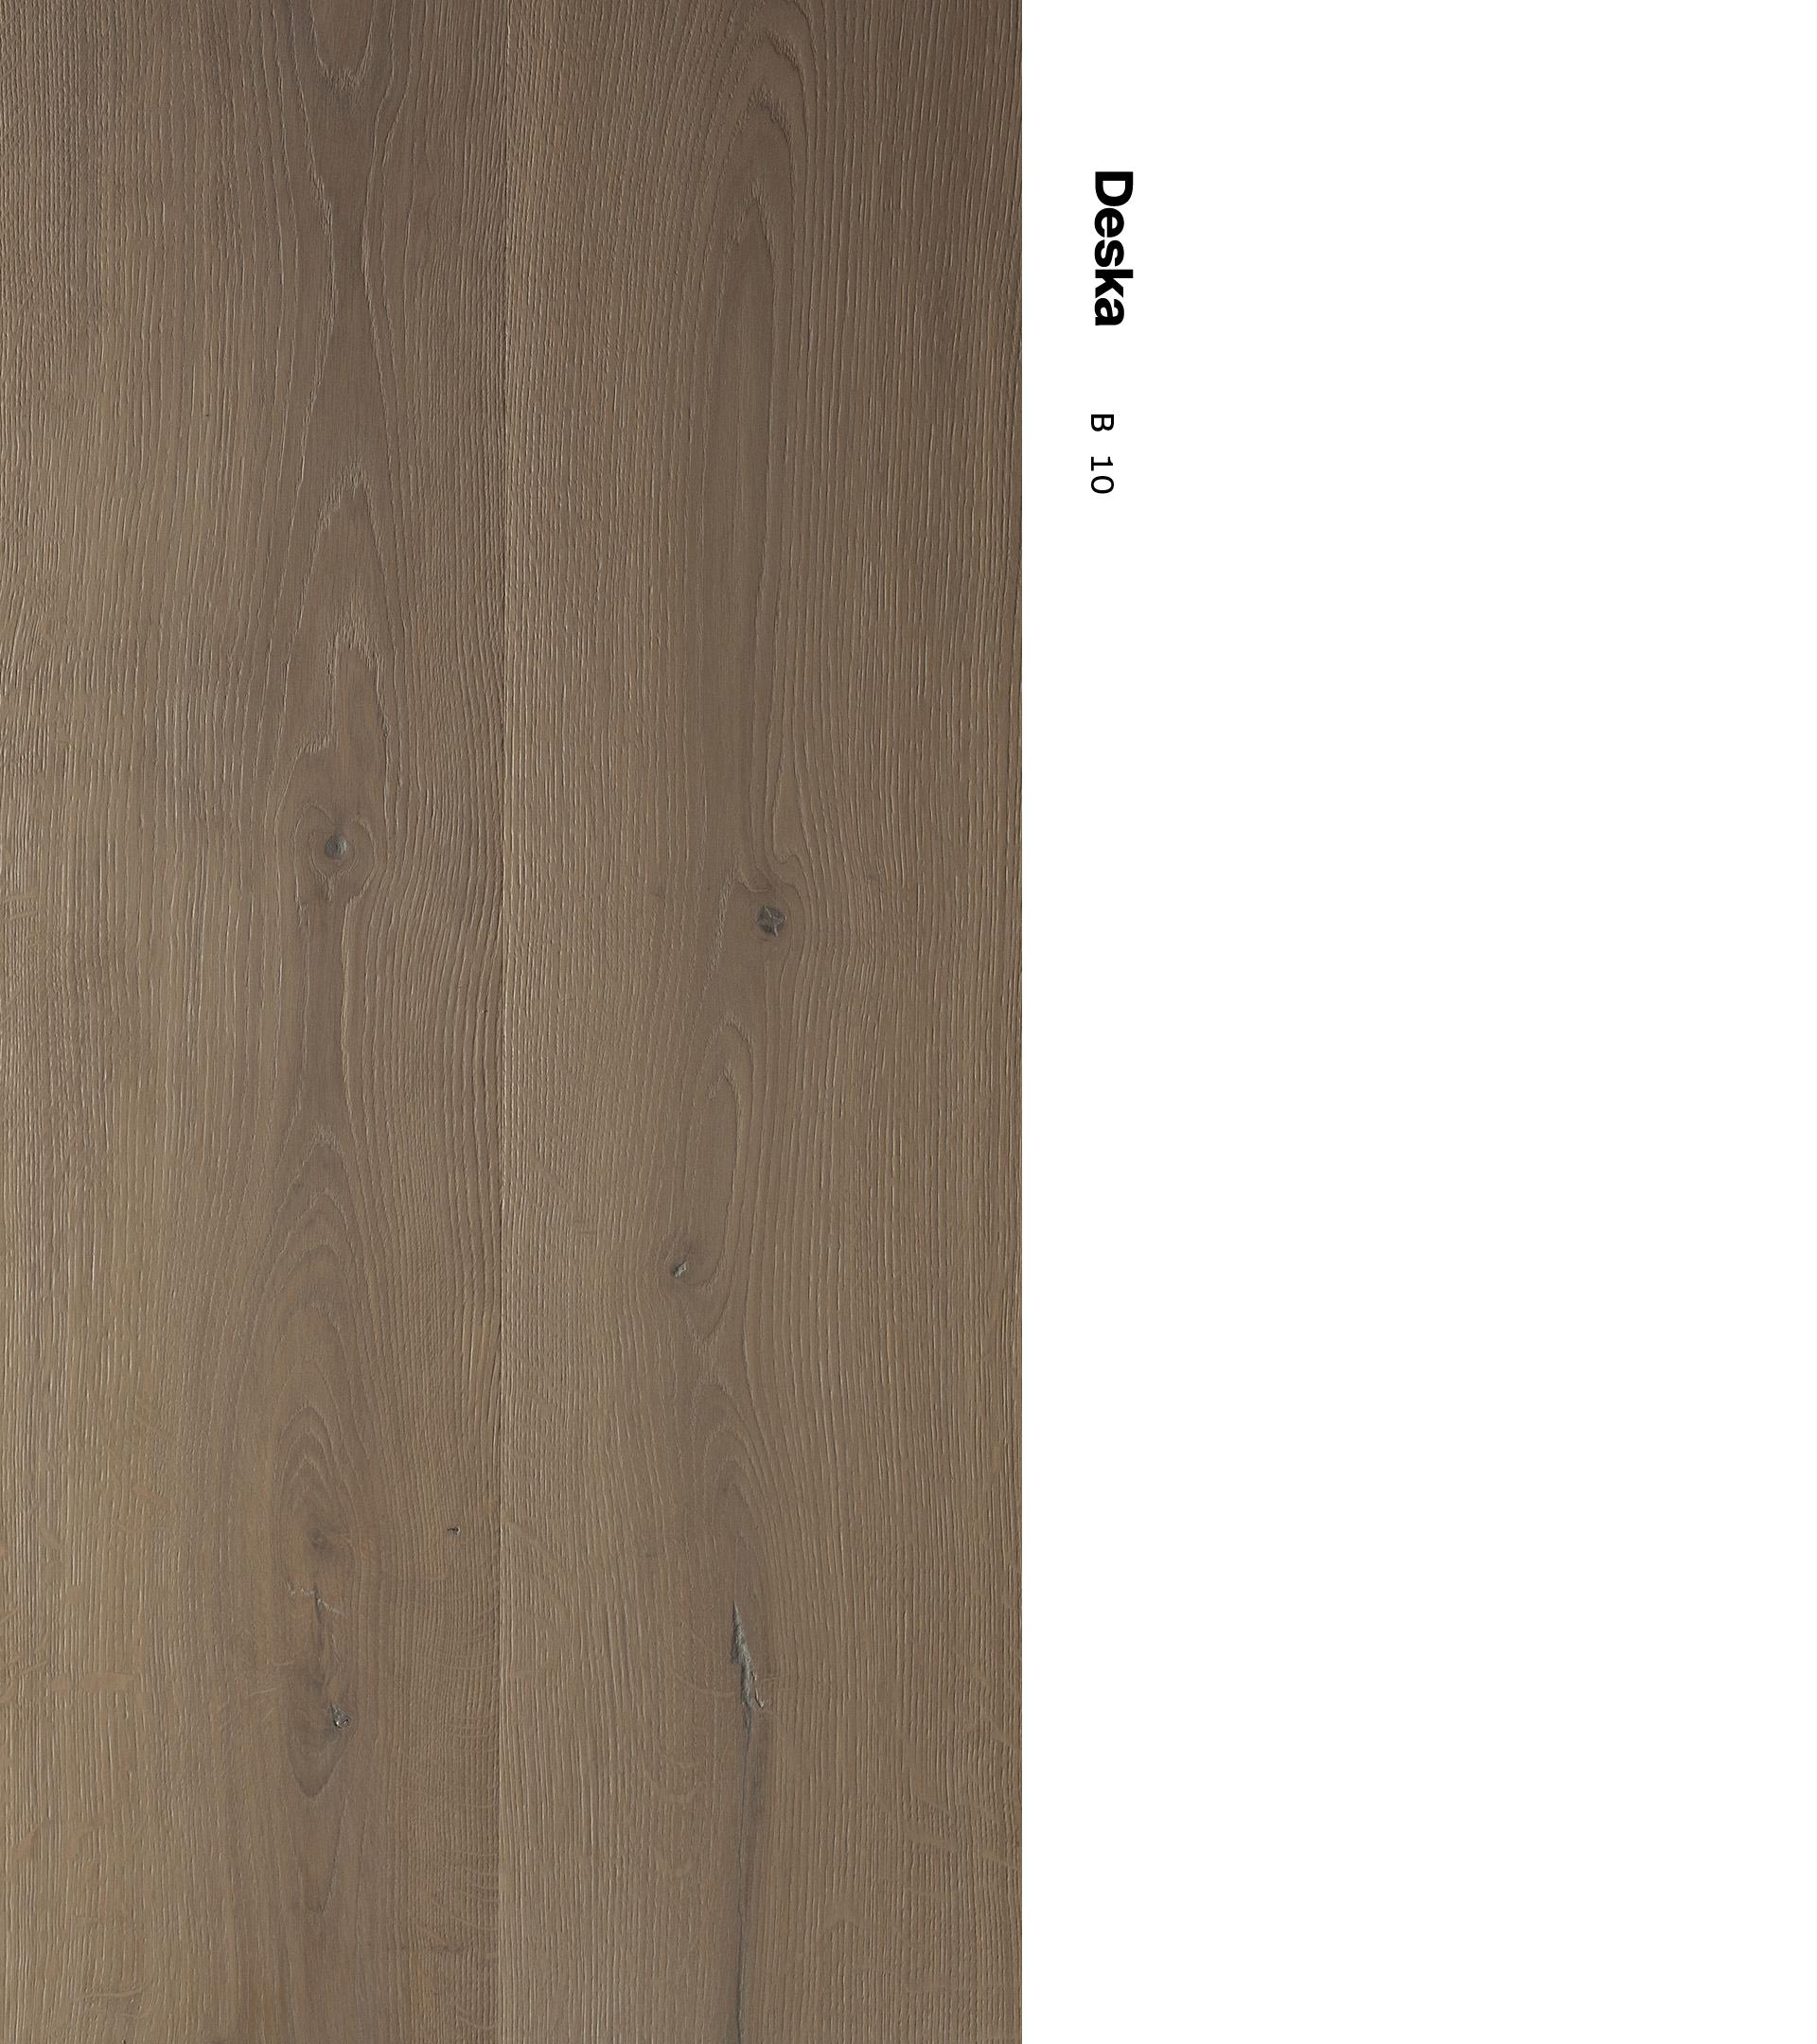 Deska - The Codeine Design